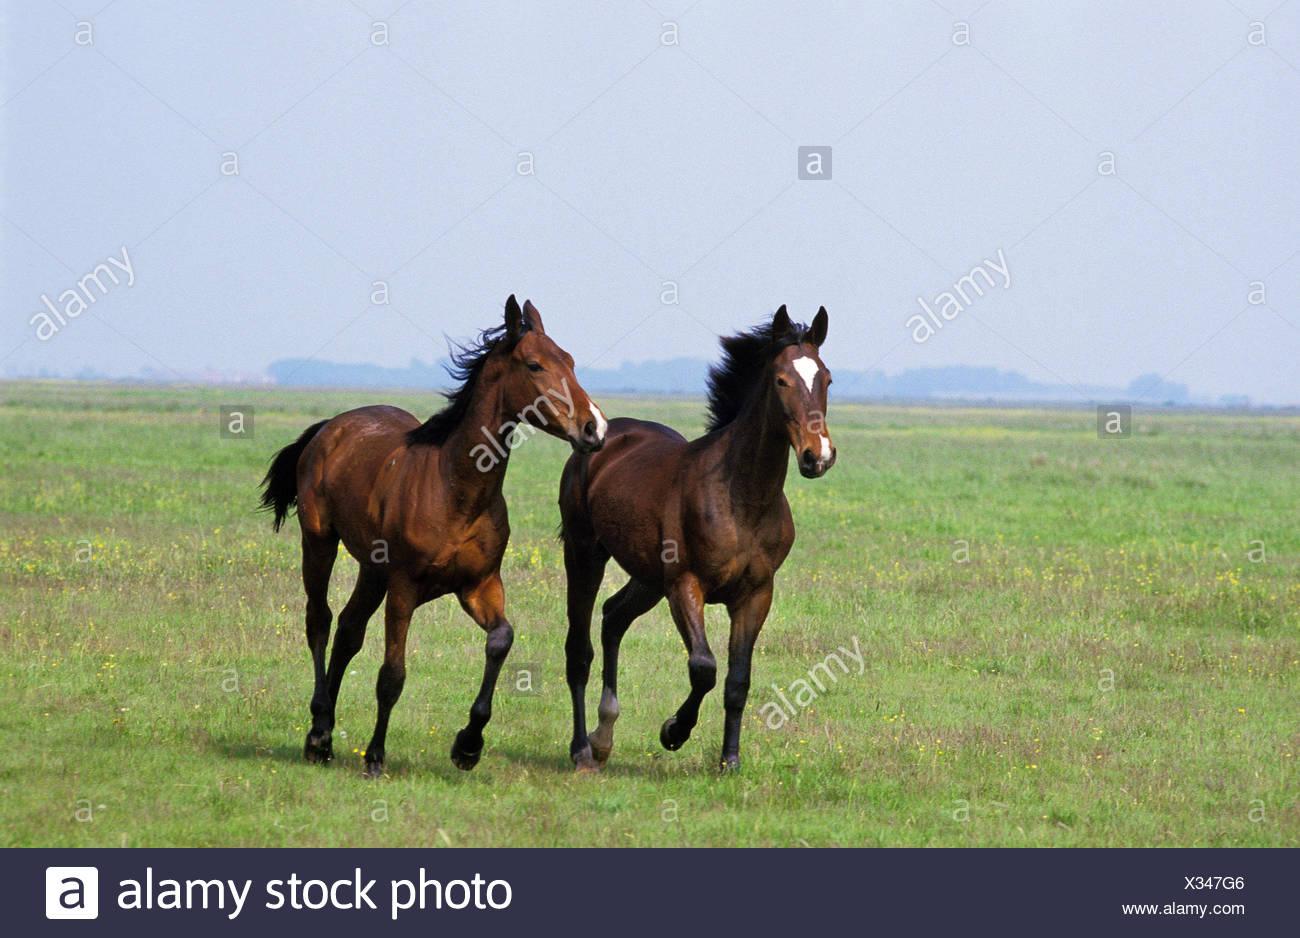 Vernier horses in Puszta, Hungary, - Stock Image